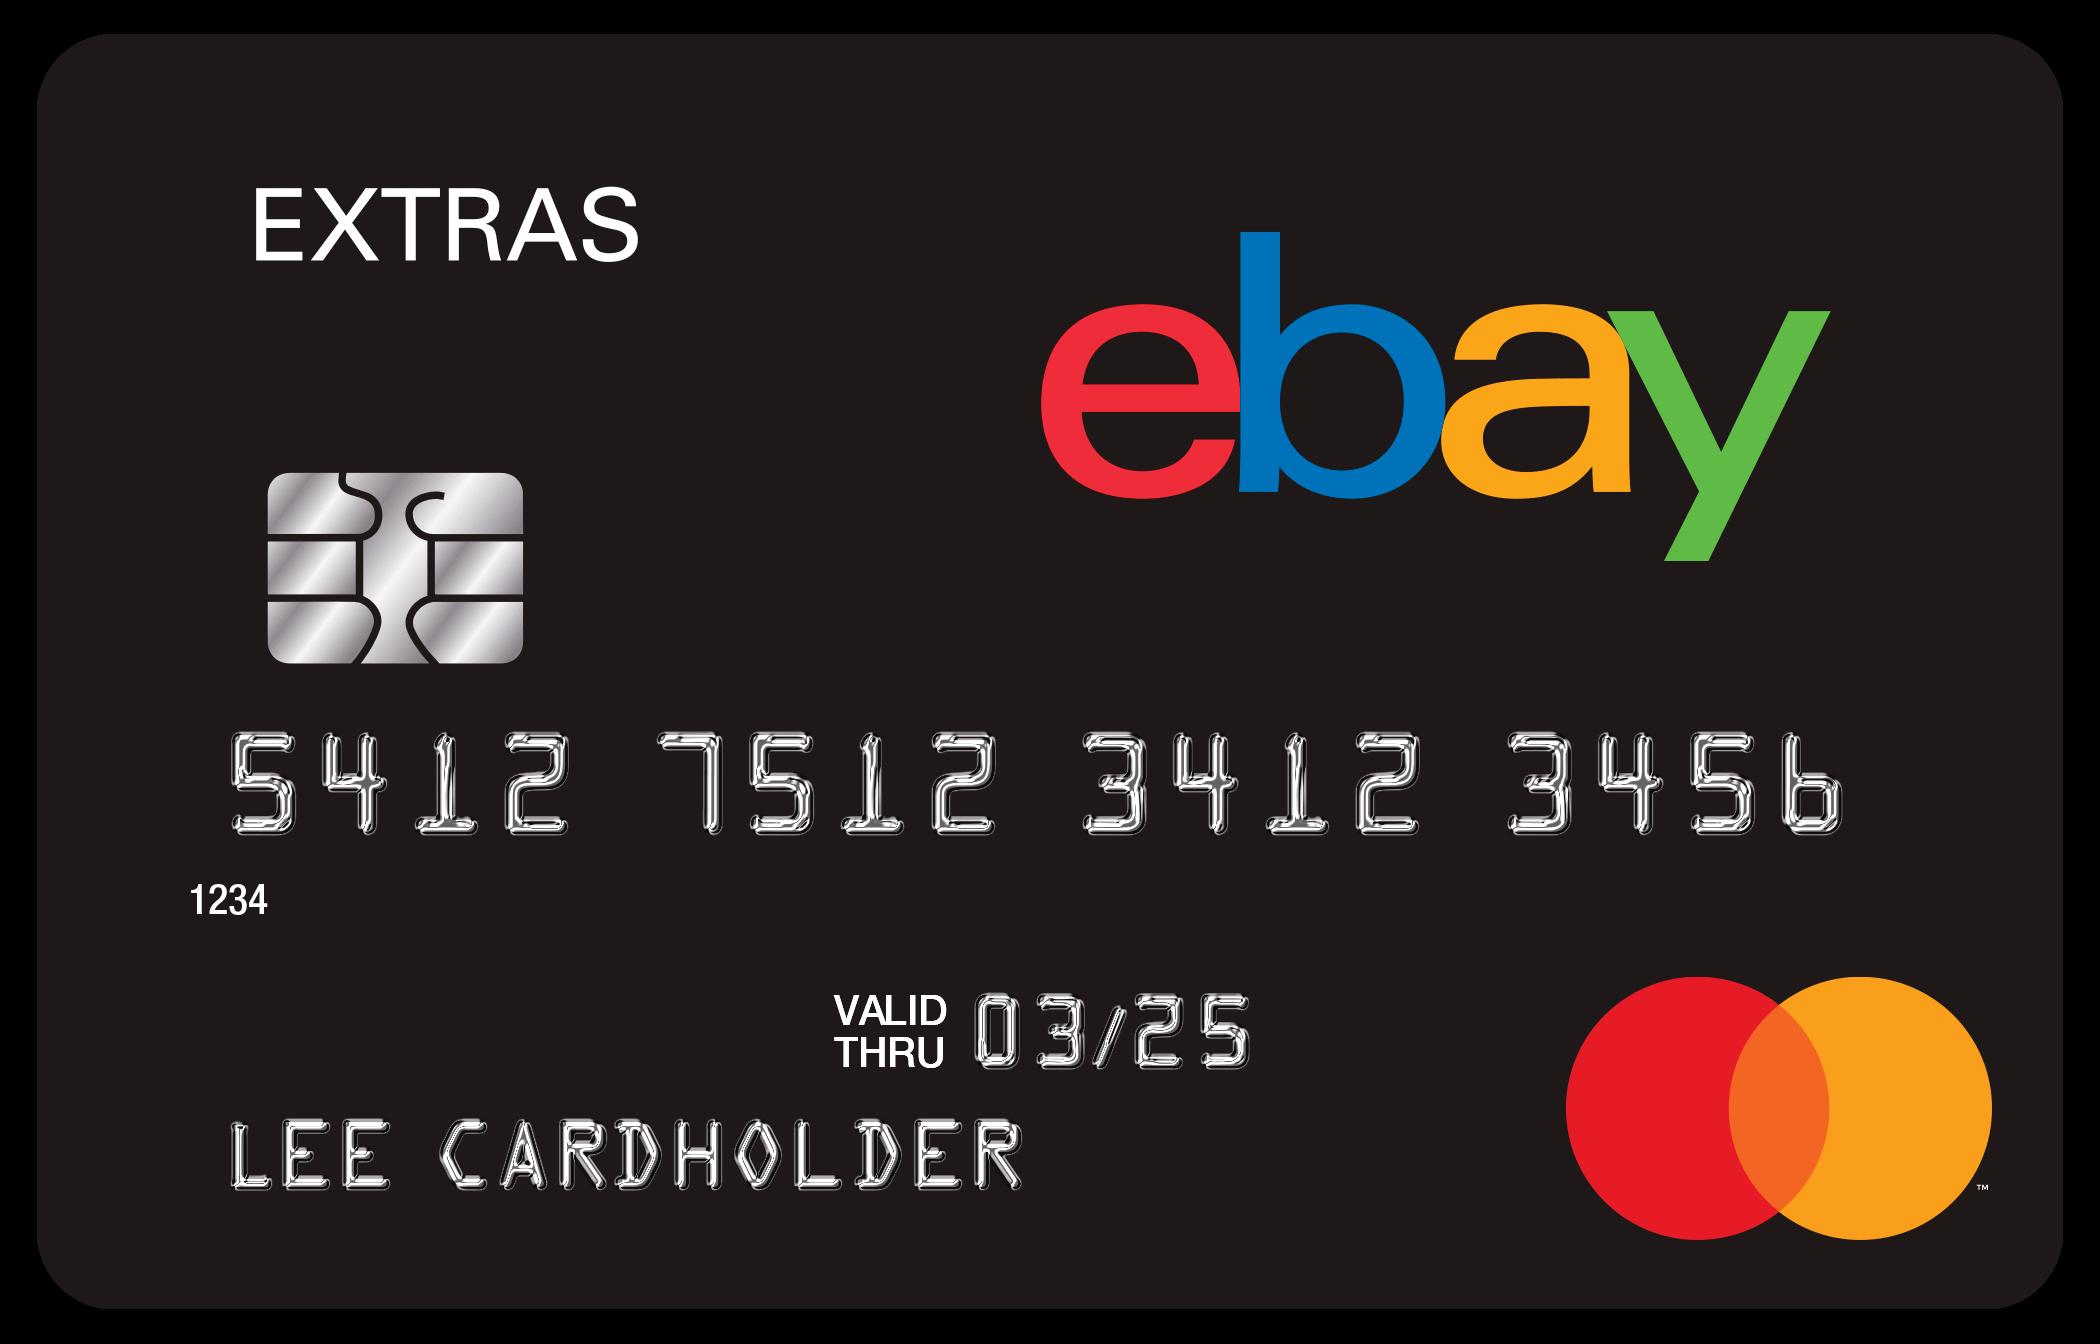 eBay Mastercard eBay.com